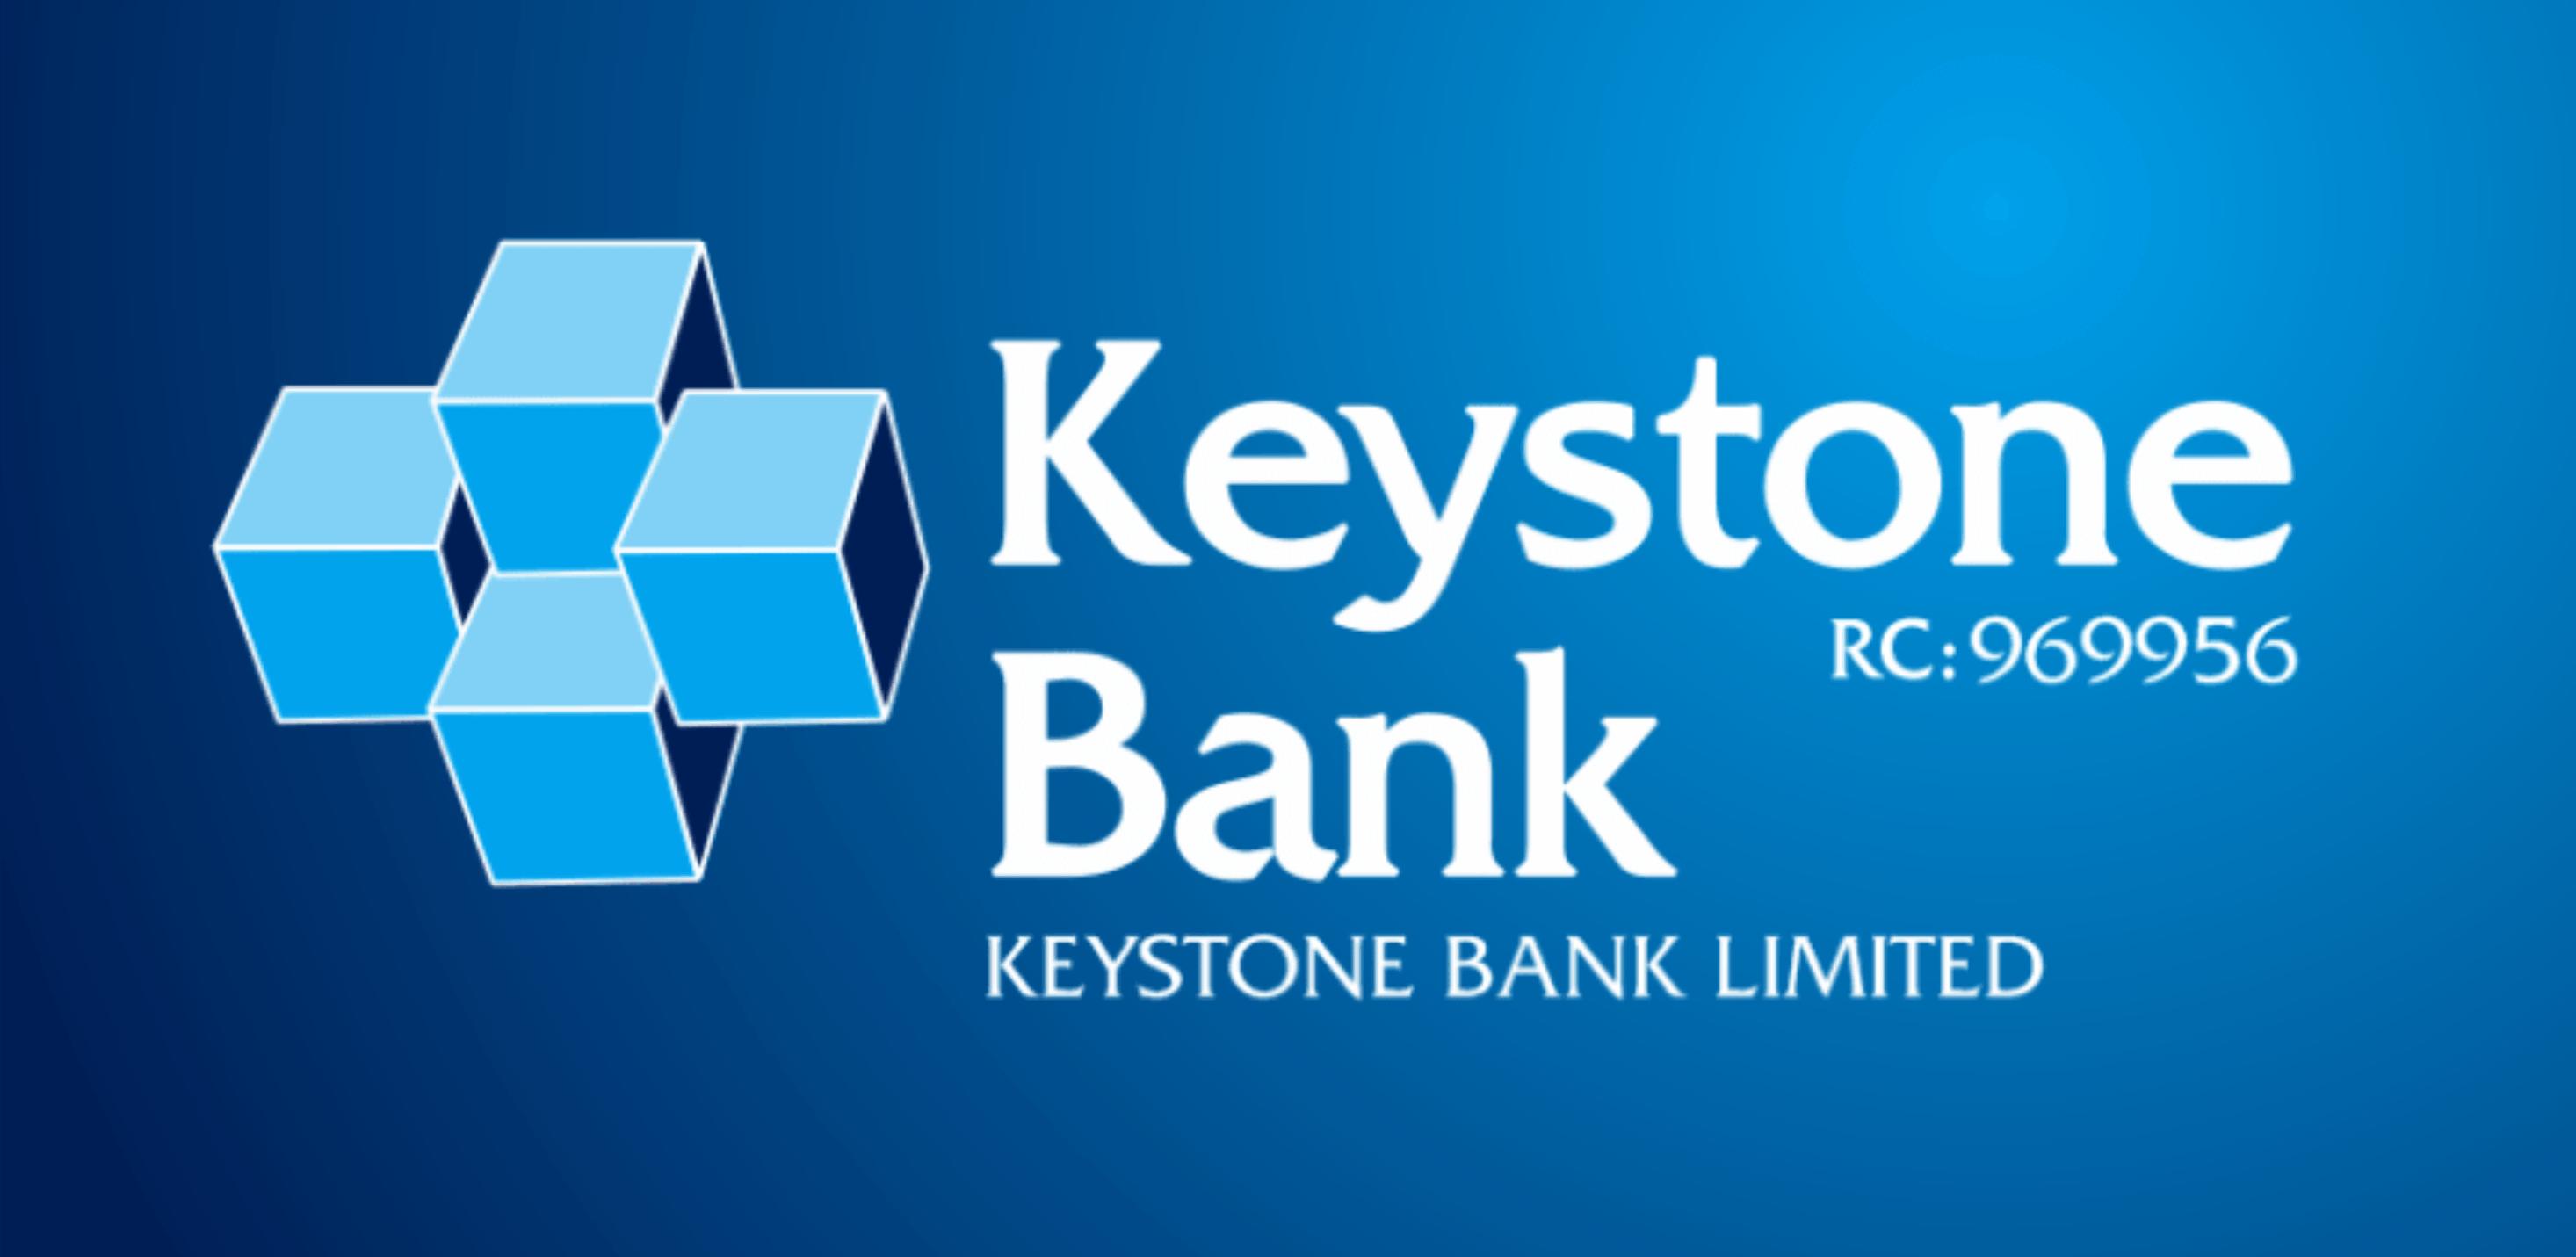 Keystone Bank PLC